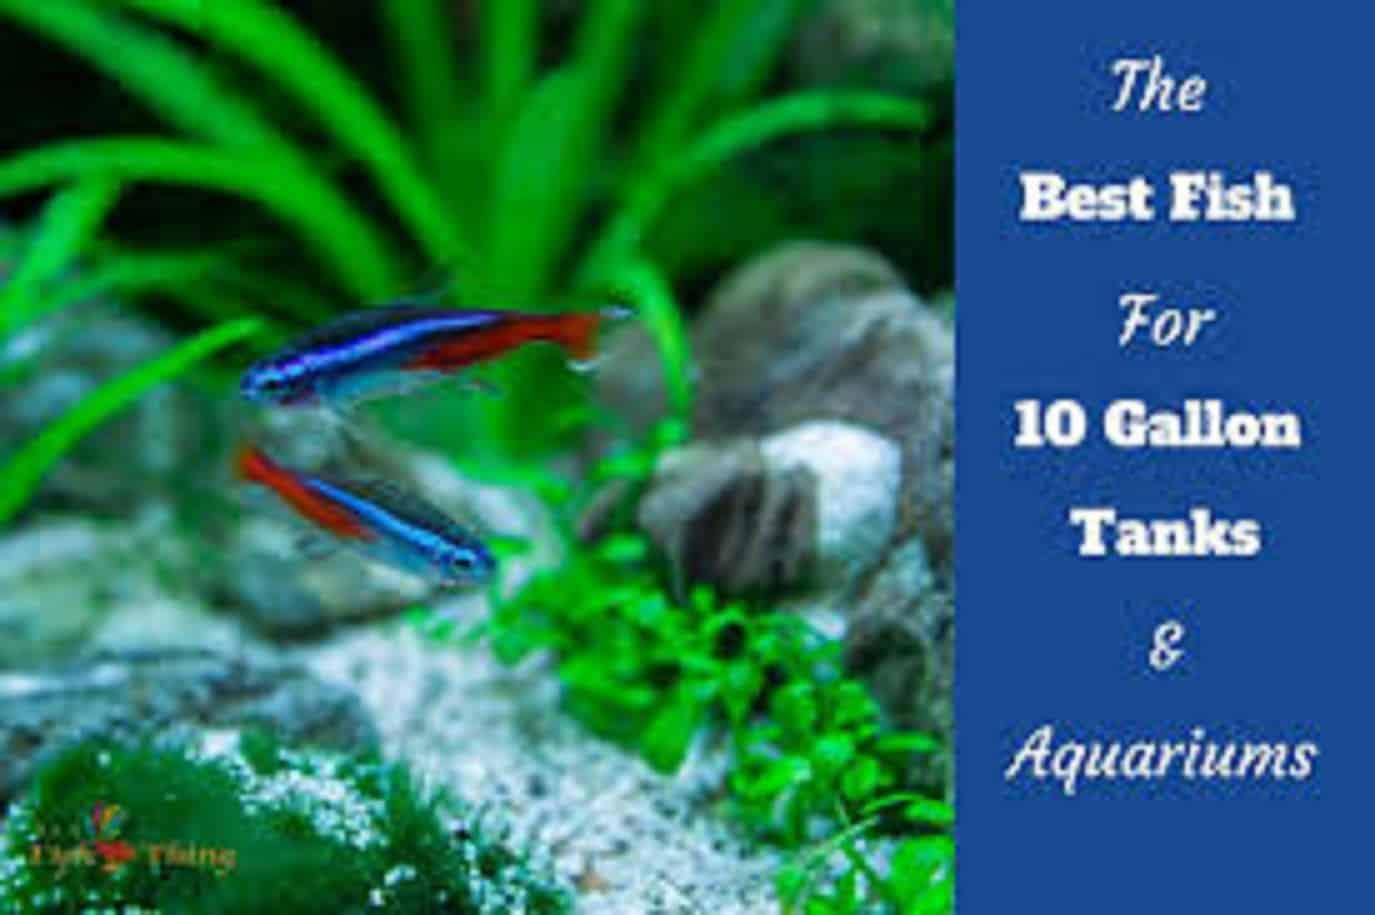 Best Fish And Invertebrates For A 10 Gallon Fish Tank